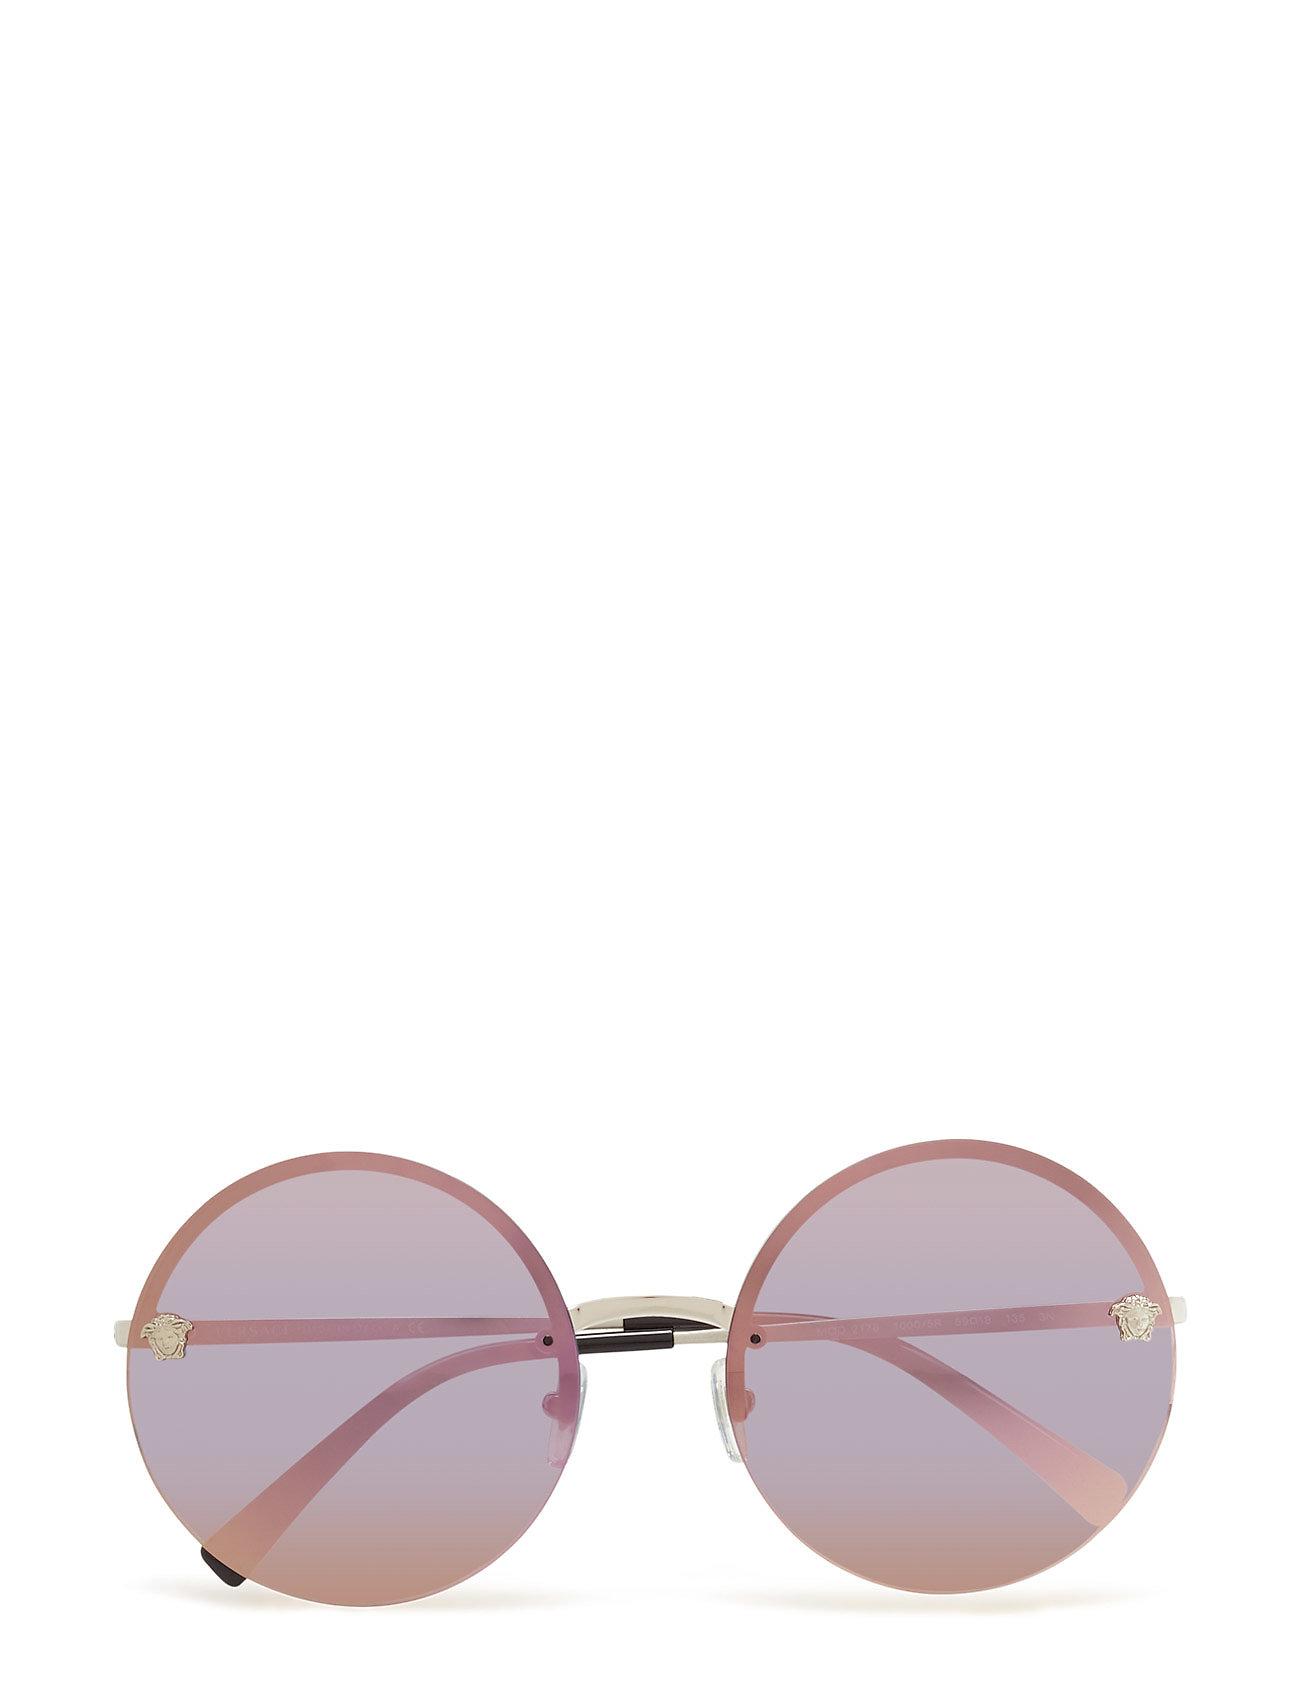 versace sunglasses – Round frame på boozt.com dk